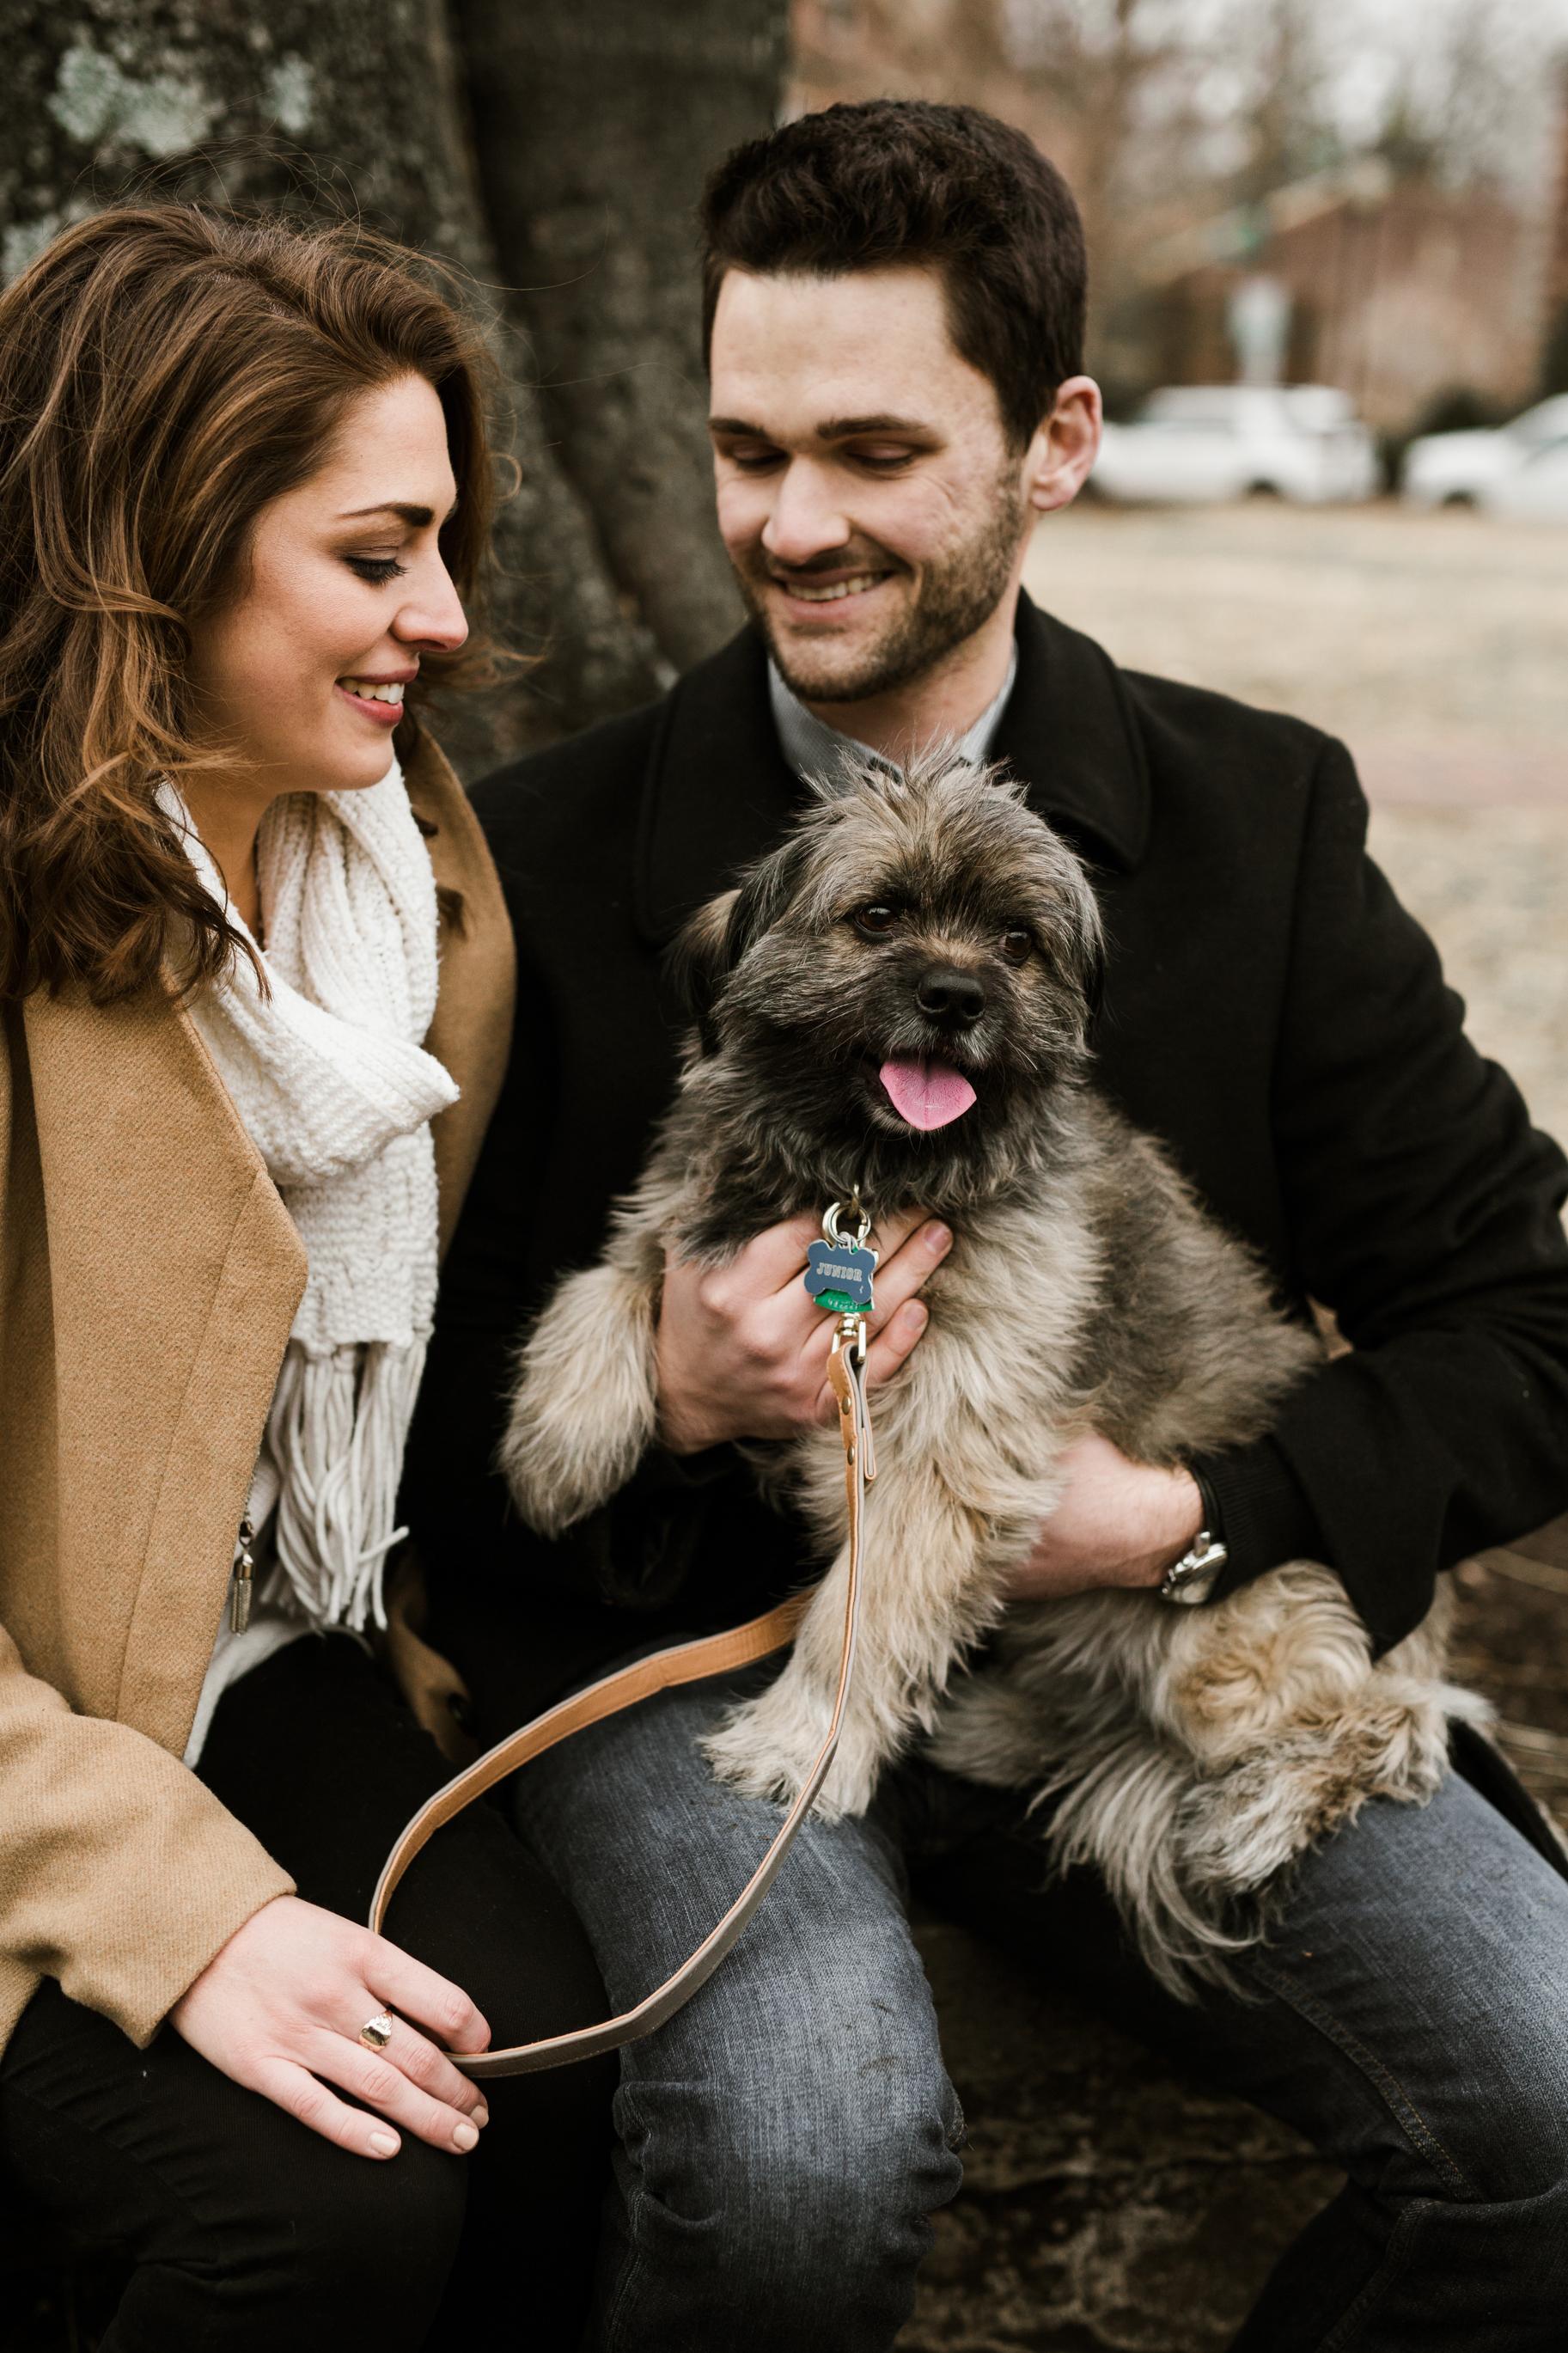 Ellen & Lee Engagement 2018 WEBSITE SP Crystal Ludwick Photo (30 of 54).jpg